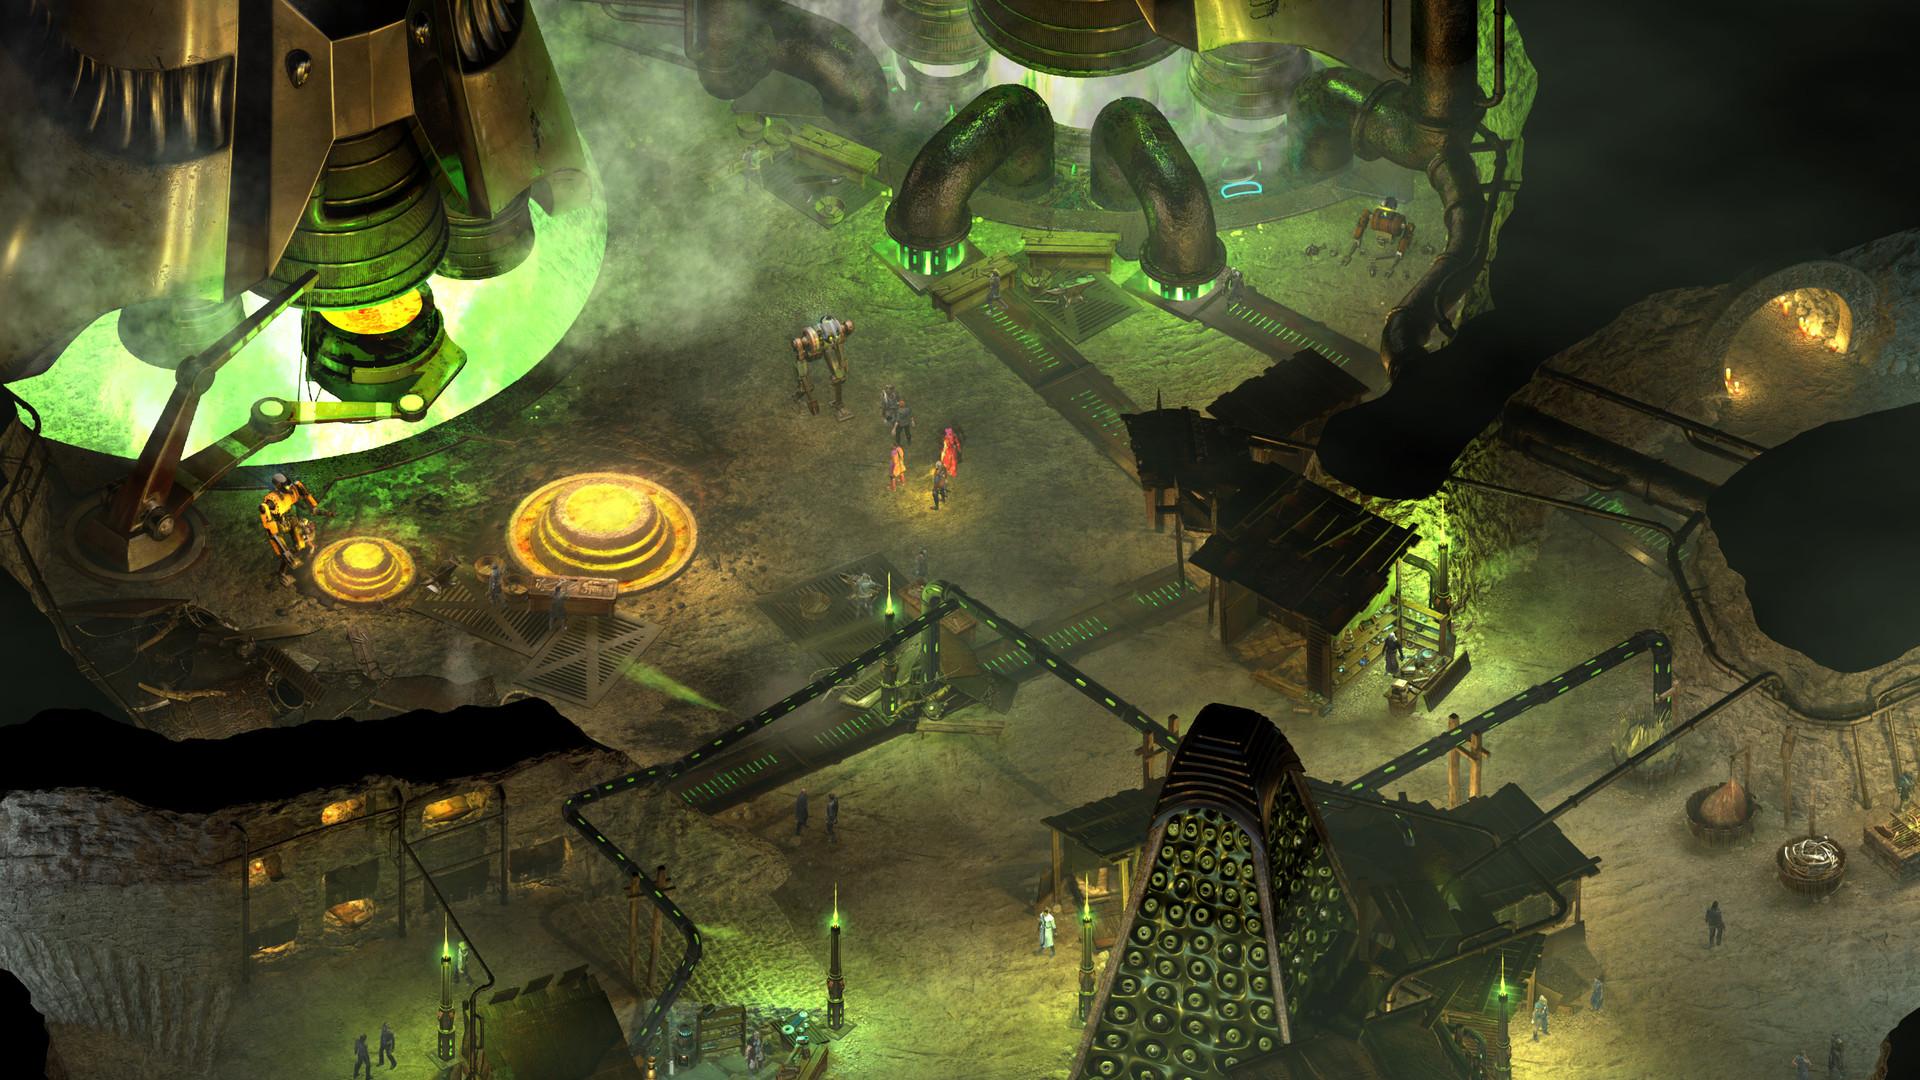 Torment: Tides of Numenera Screenshot 3